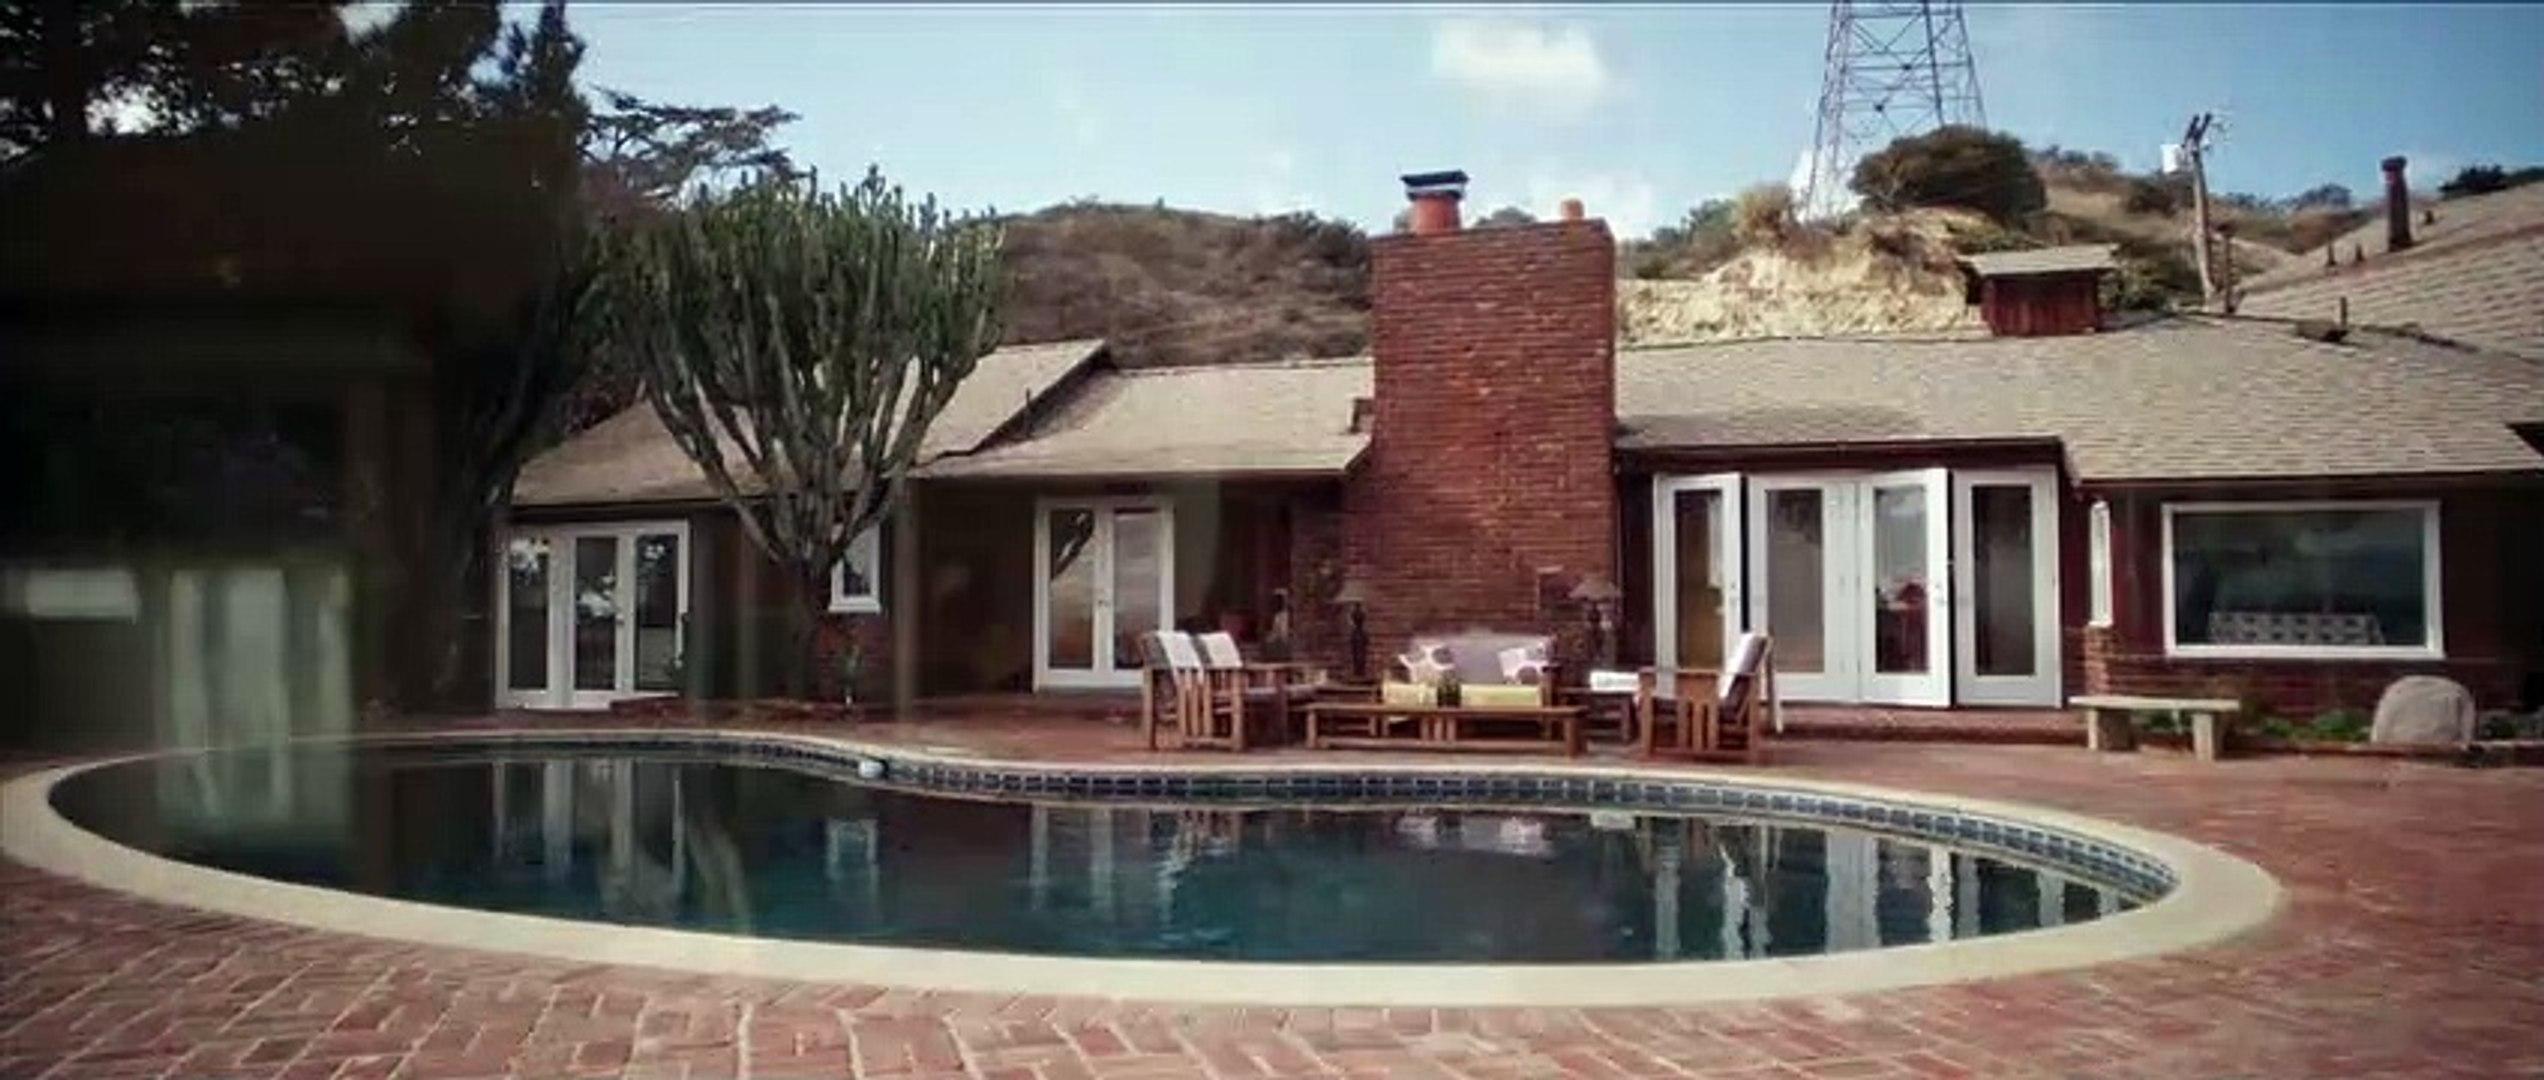 The Haunting of Sharon Tate Trailer #1 (2019) Hilary Duff, Jonathan Bennett Horror Movie HD